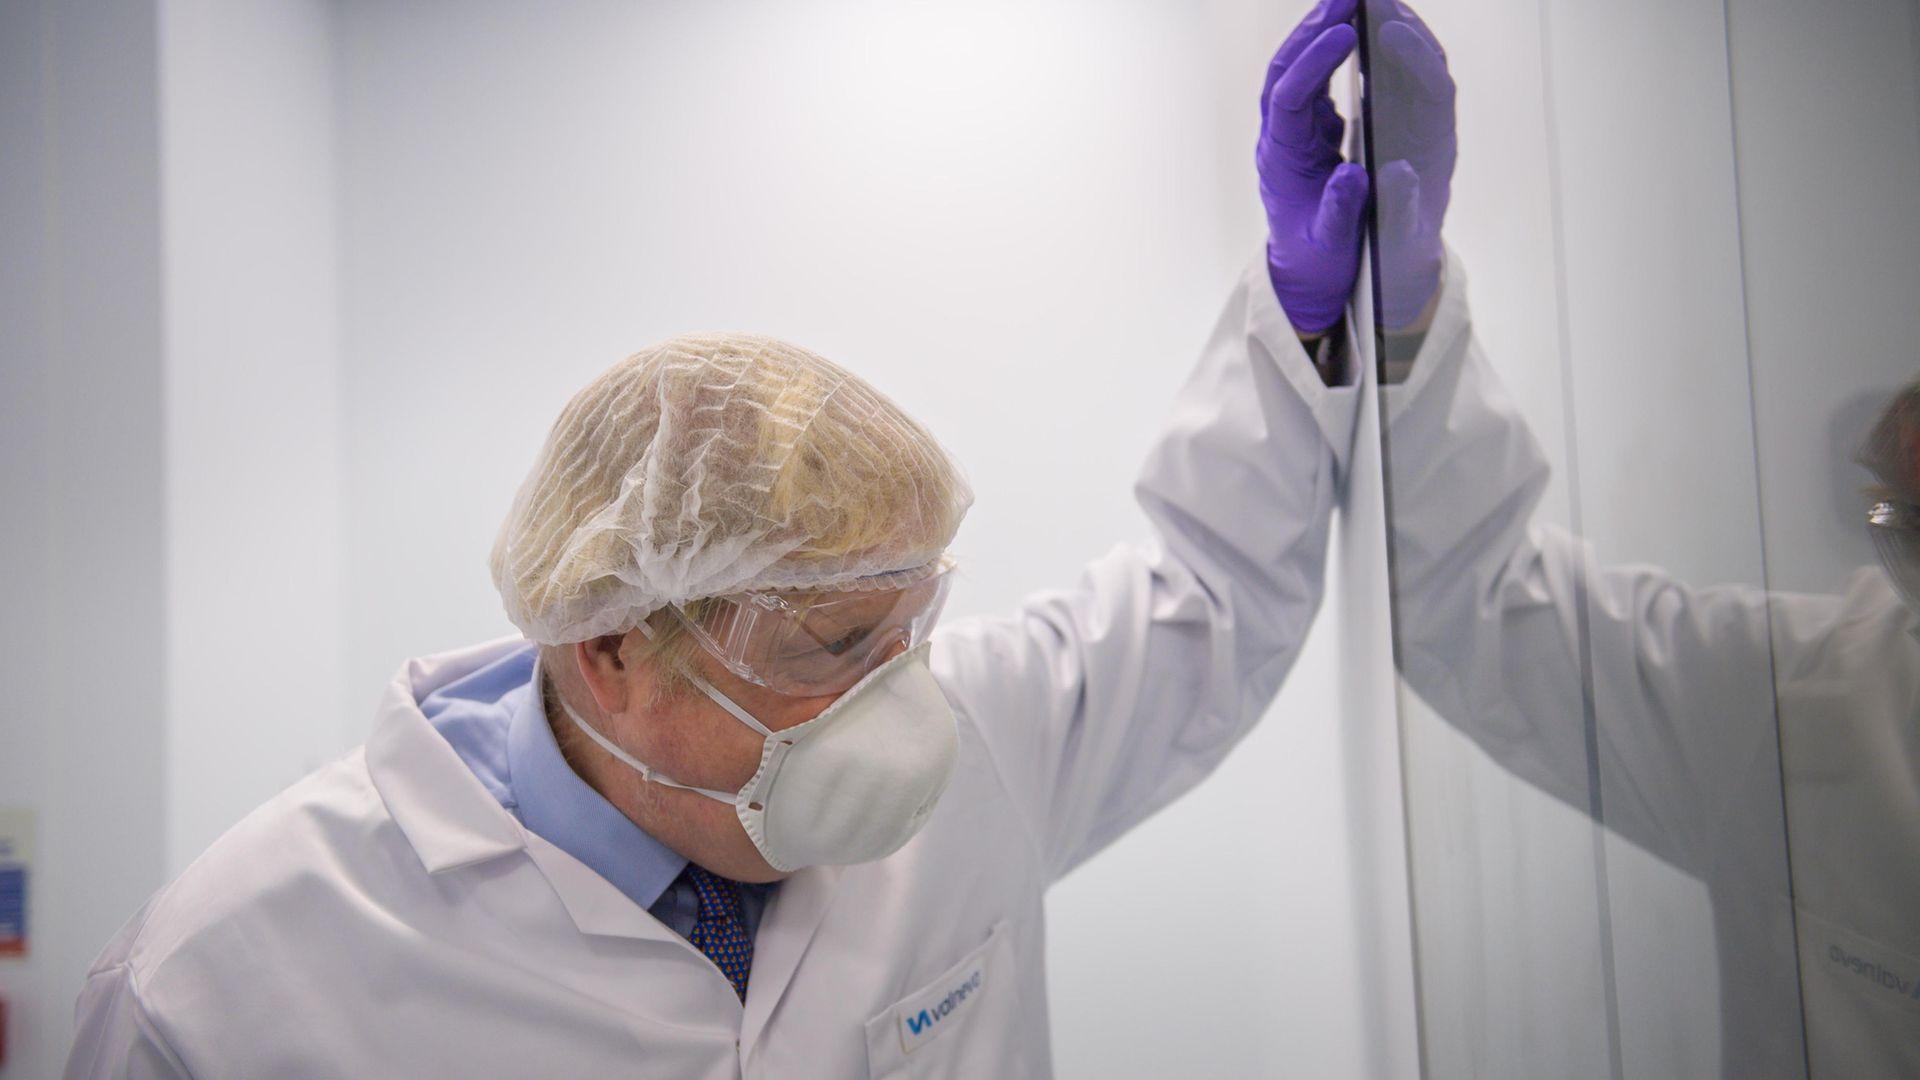 Prime Minister Boris Johnson visiting the French biotechnology laboratory Valneva in Livingston - Credit: PA